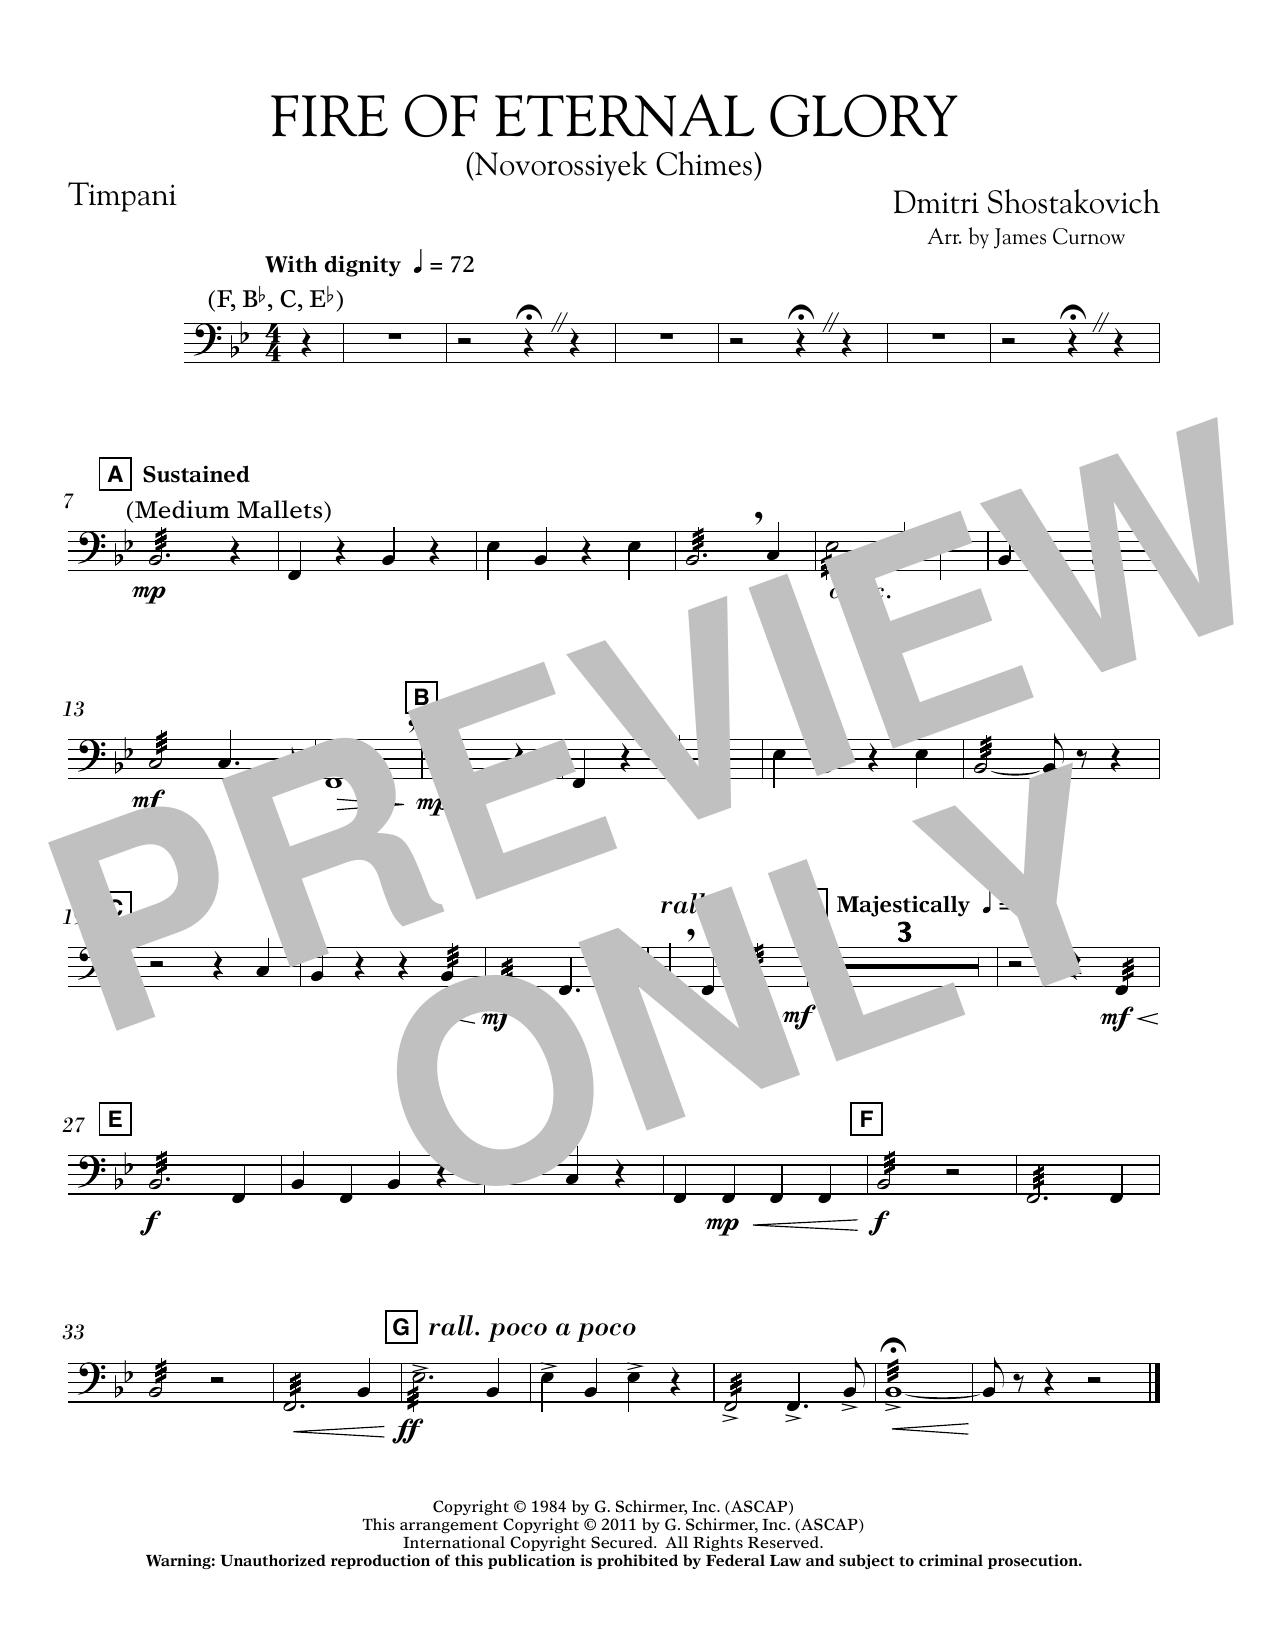 James Curnow Fire of Eternal Glory (Novorossiyek Chimes) - Timpani sheet music notes printable PDF score